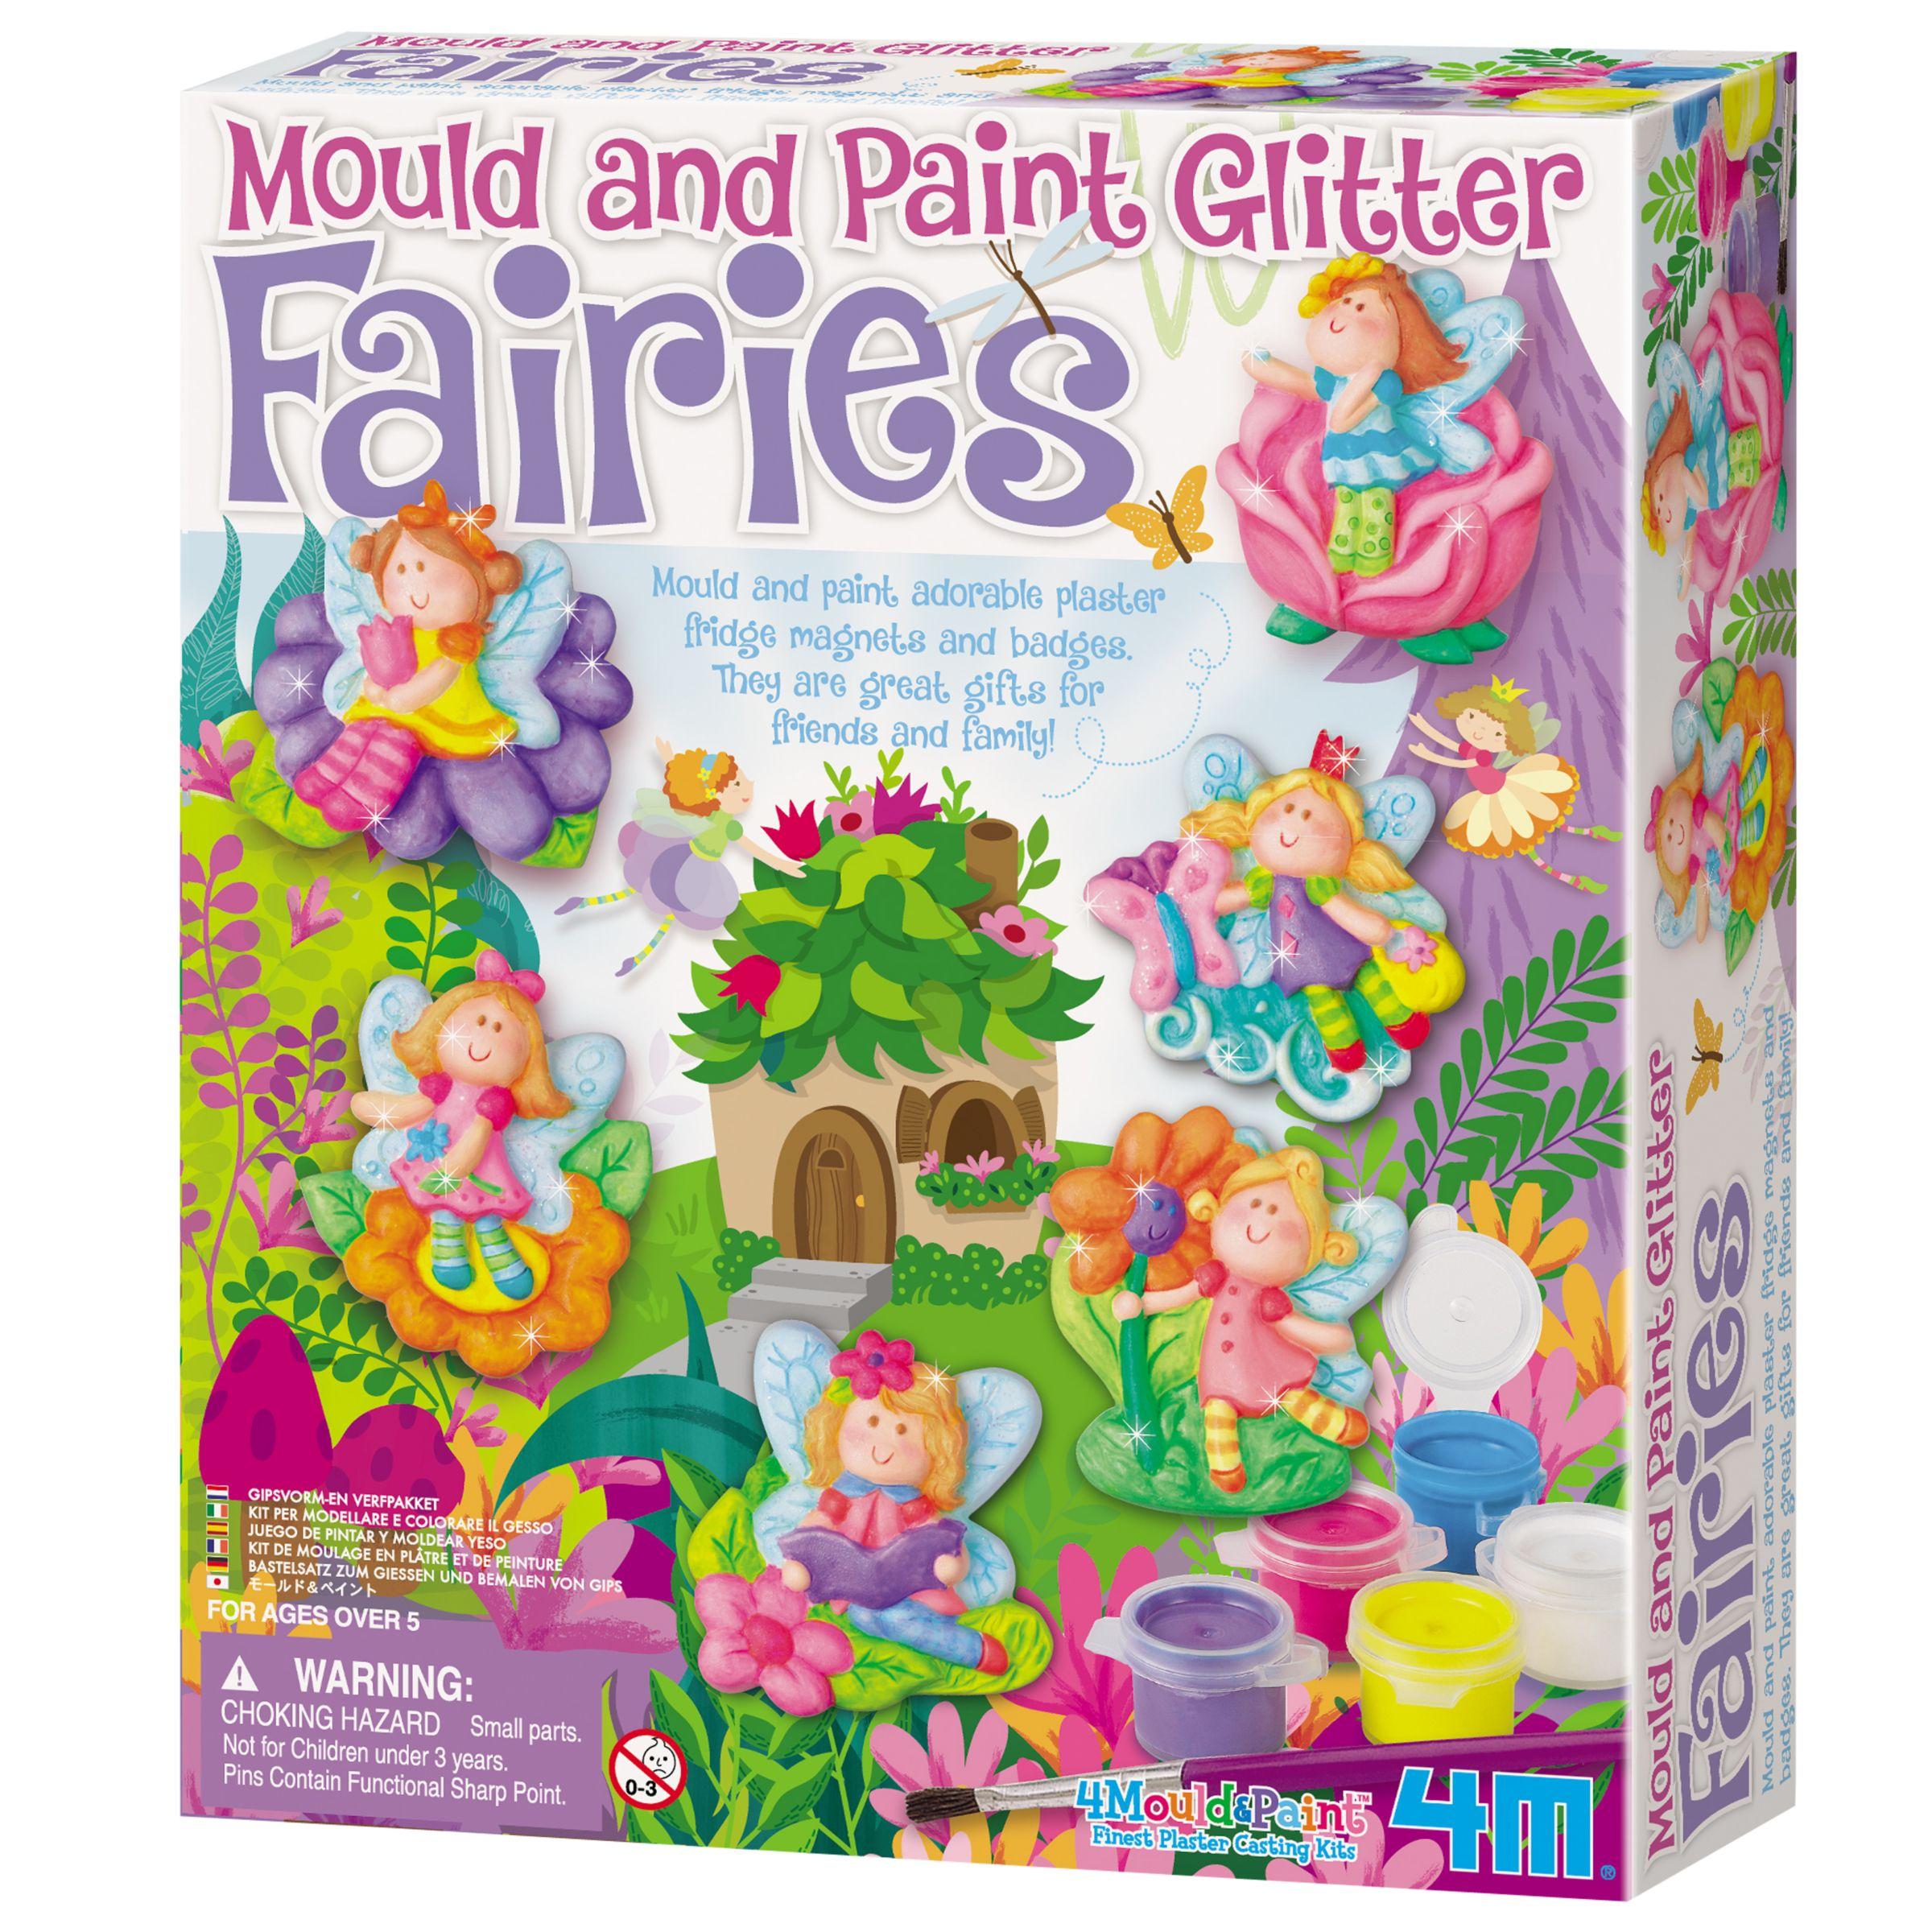 Great Gizmos Mould & Paint Glitter Fairies Kit